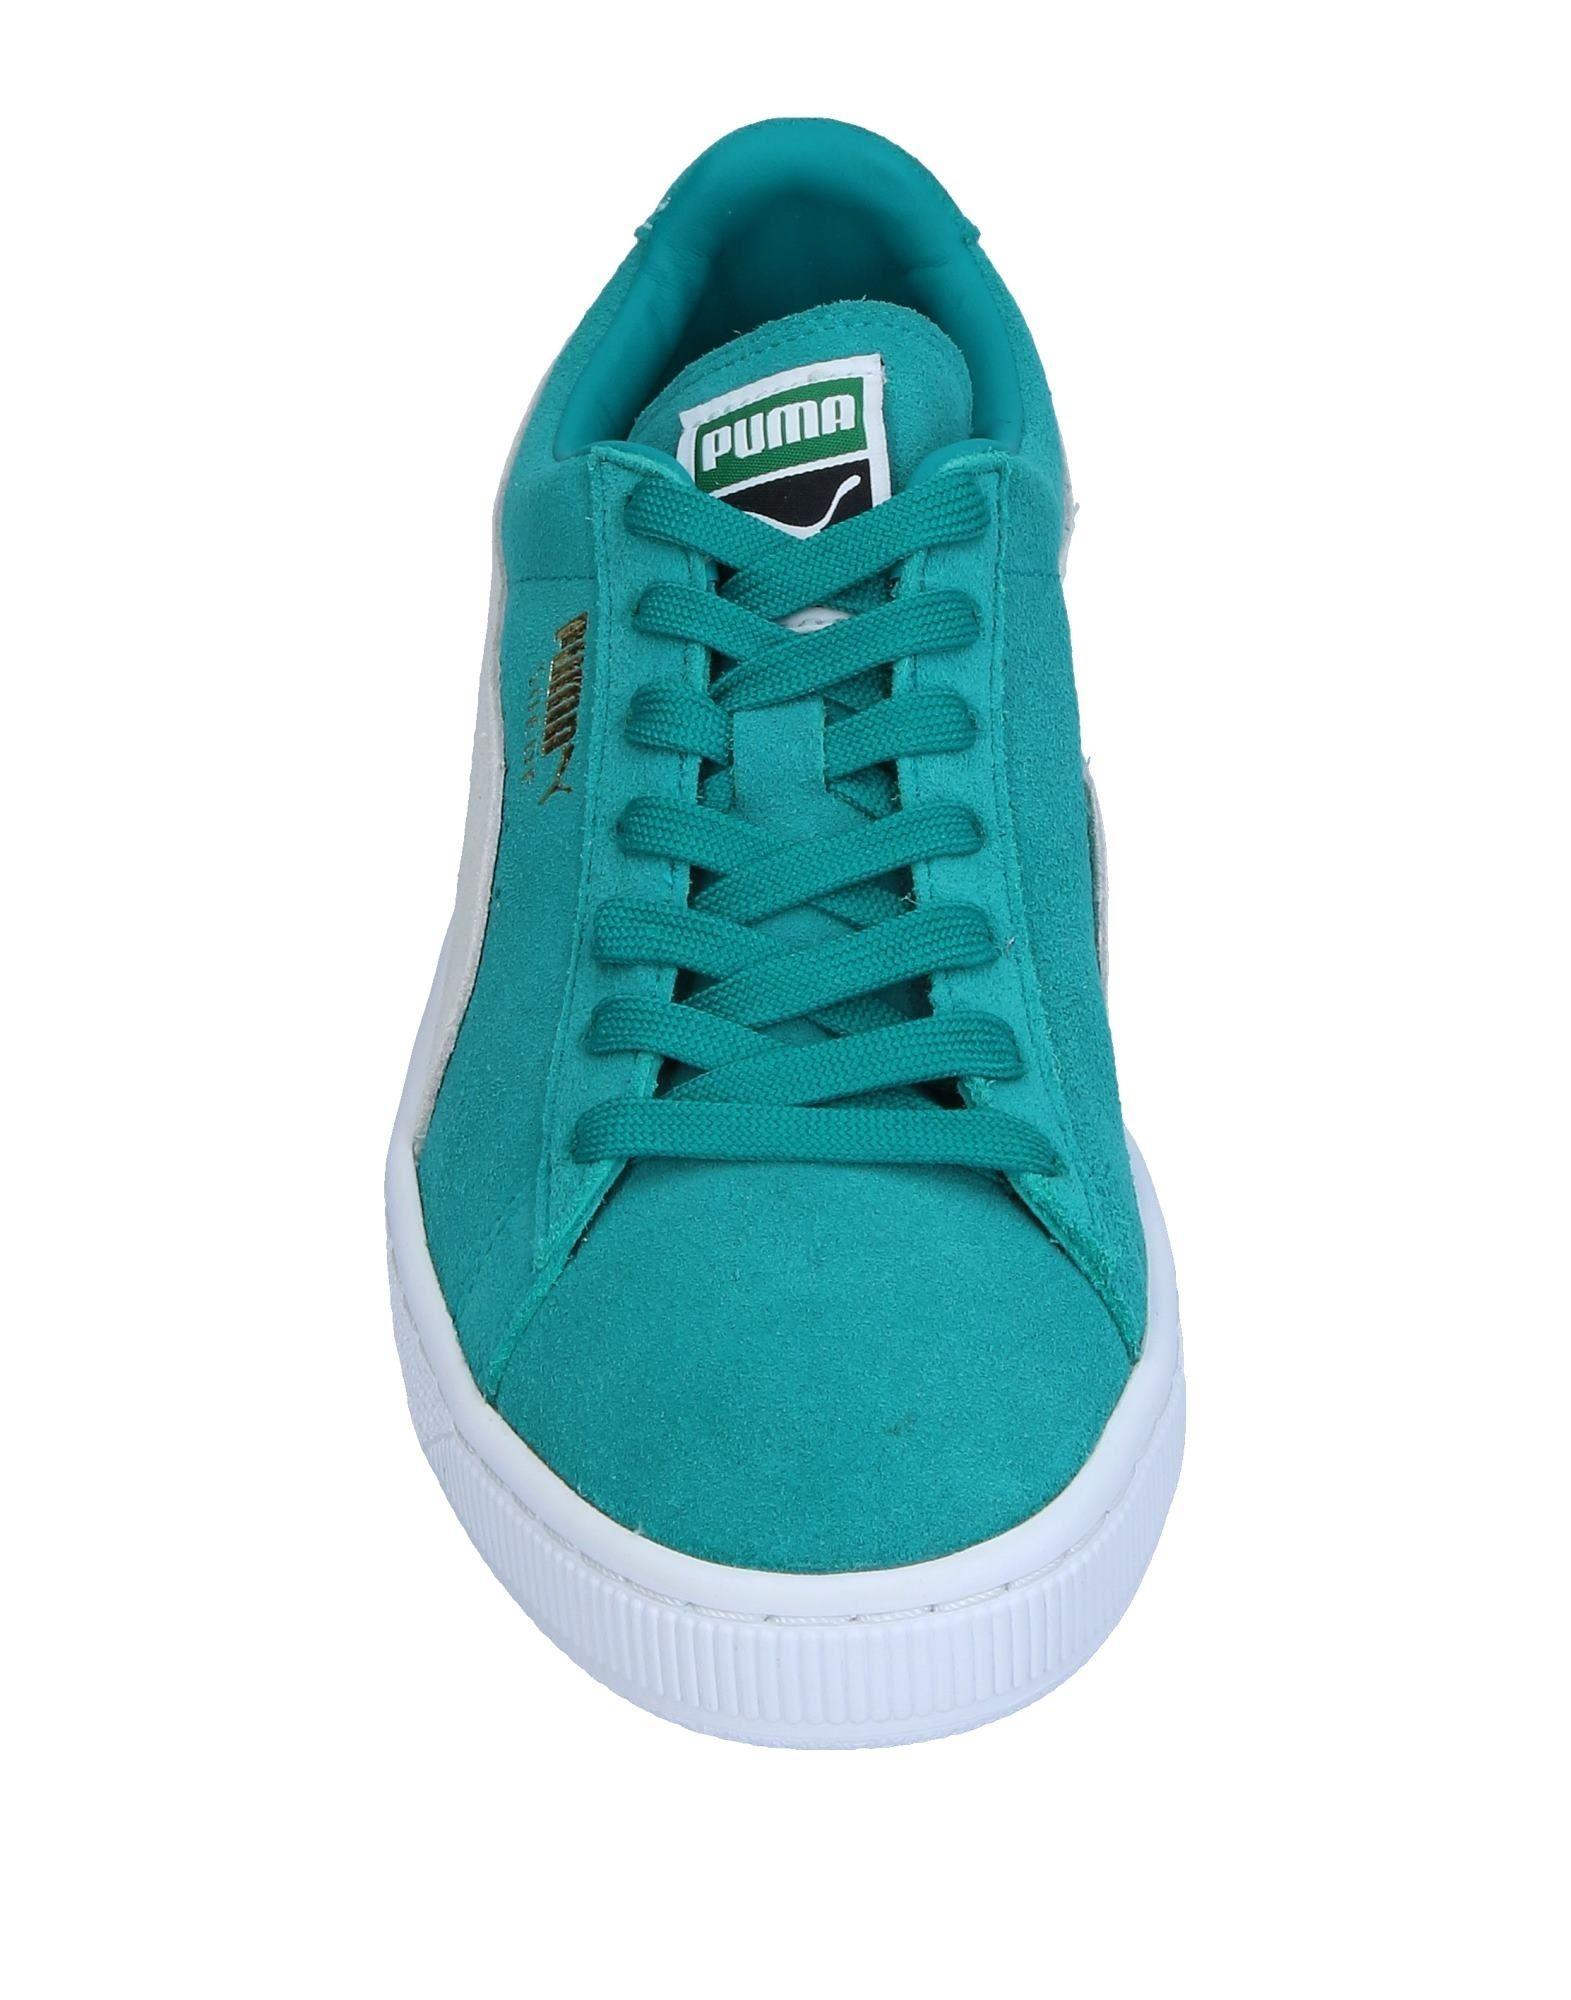 Puma Sneakers Damen  11333533EU Gute Qualität beliebte Schuhe Schuhe Schuhe 768e99